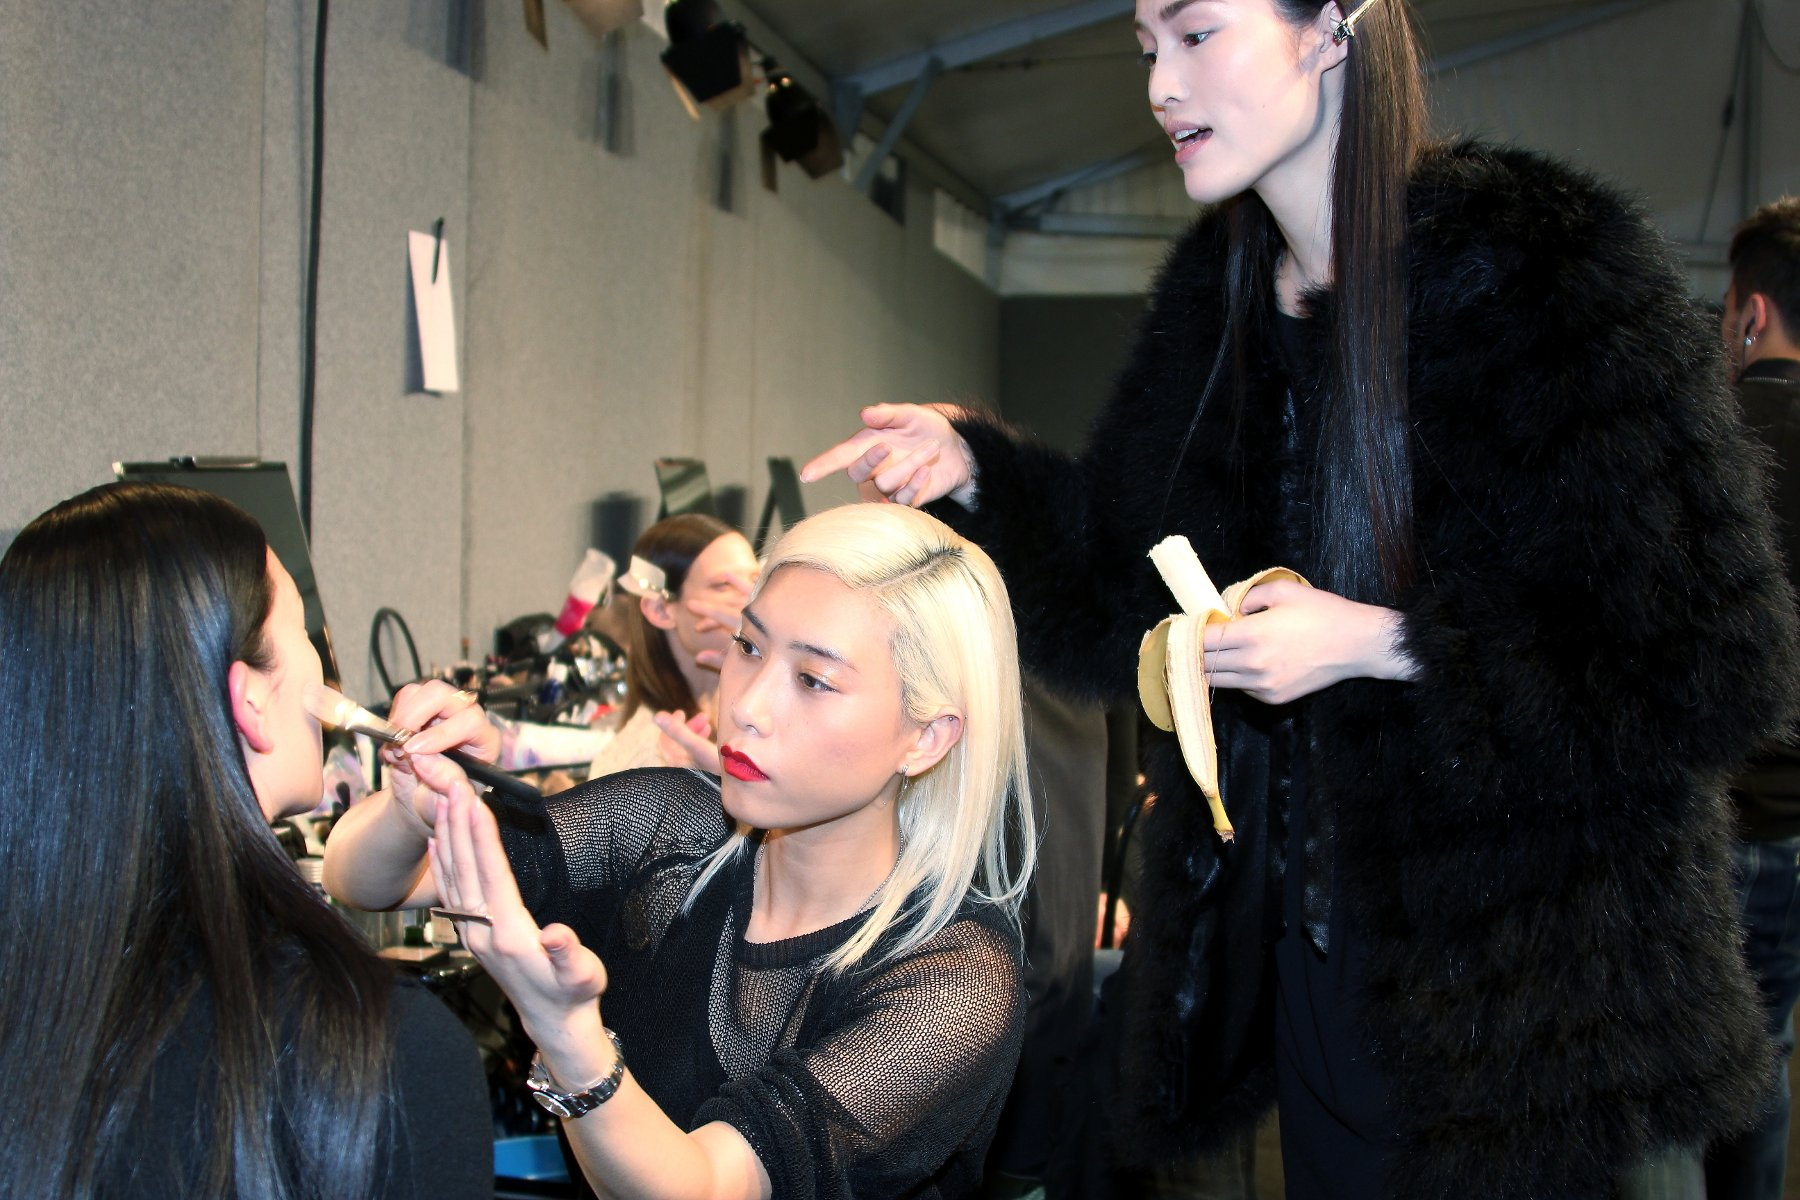 Backstage Anteprima 2012